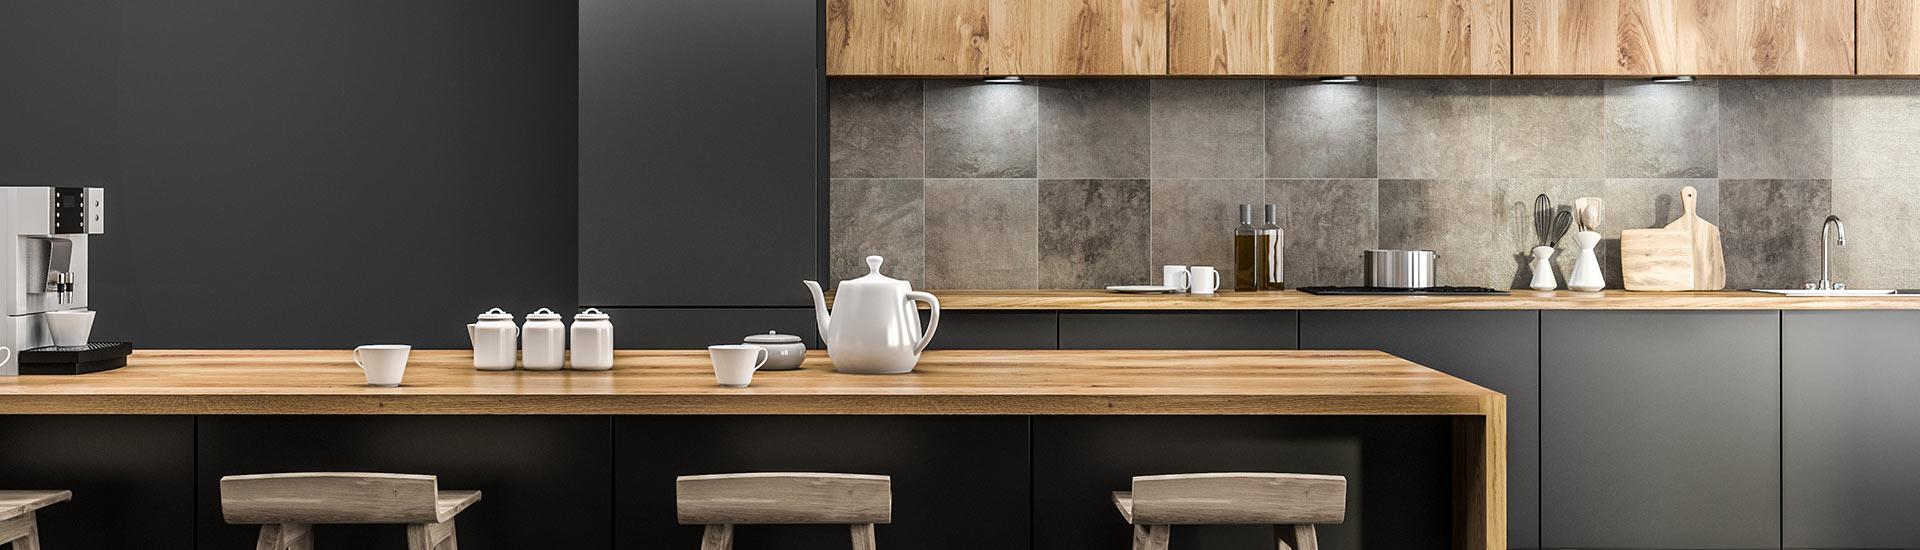 Moderne offene helle Küche